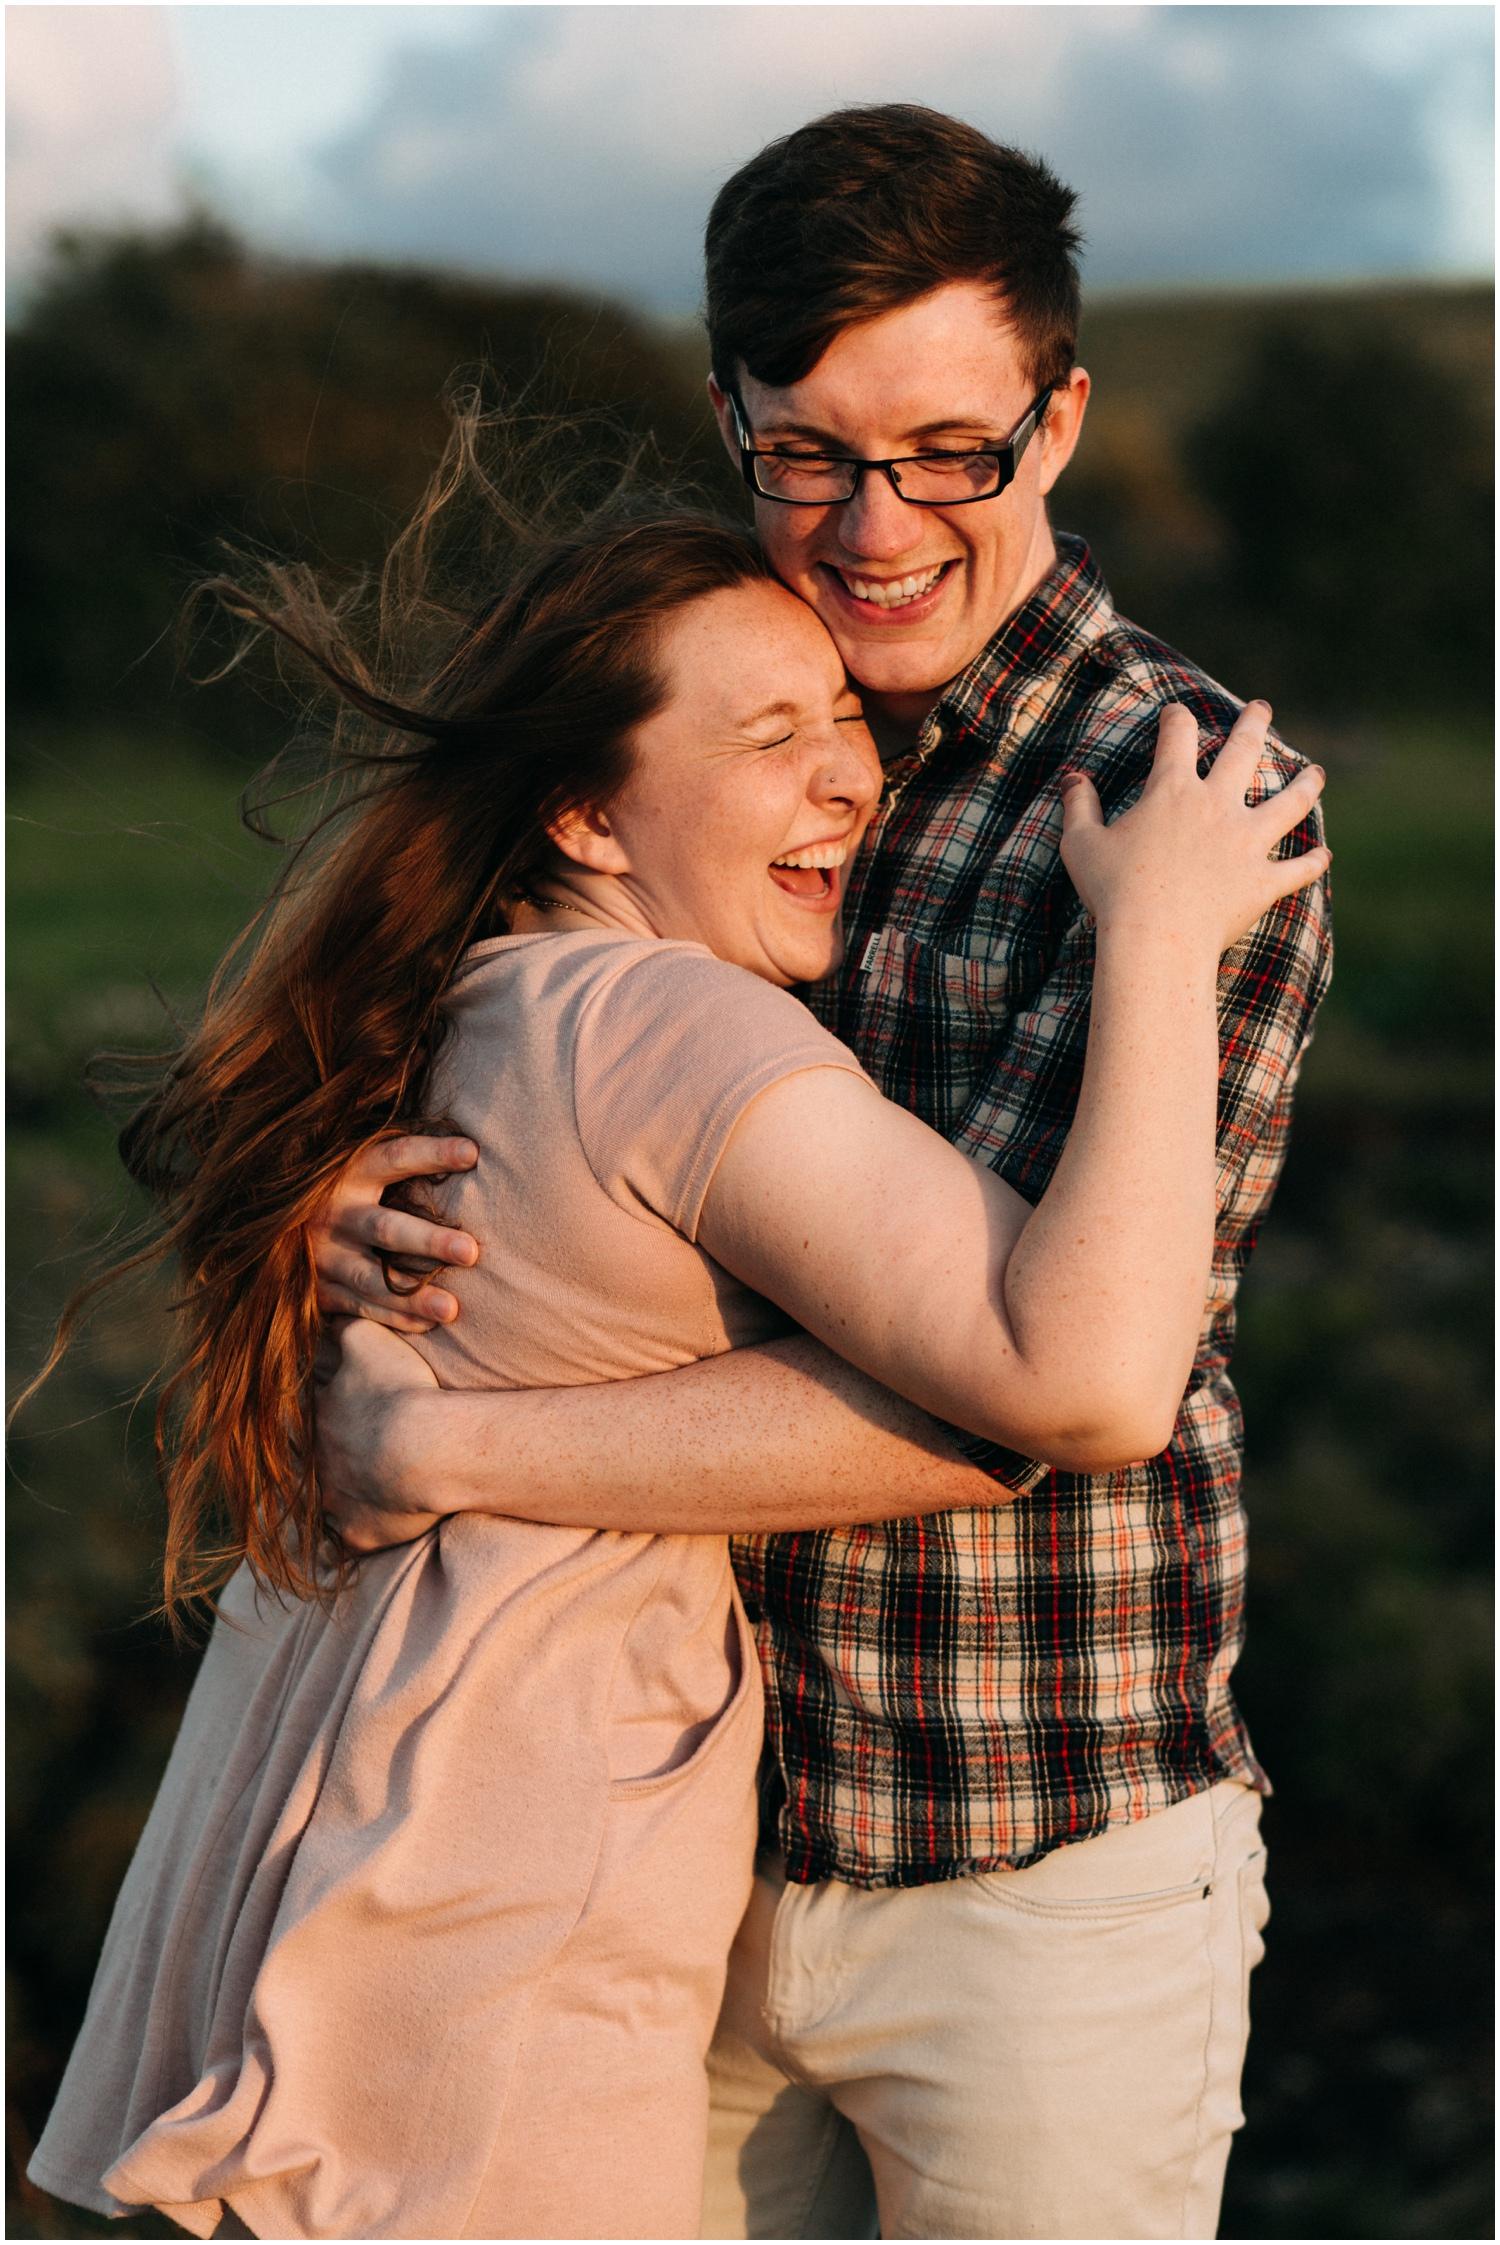 ireland_engagement_adventure_session_irish_couple_international_photographer_taylor_powers__0009.jpg